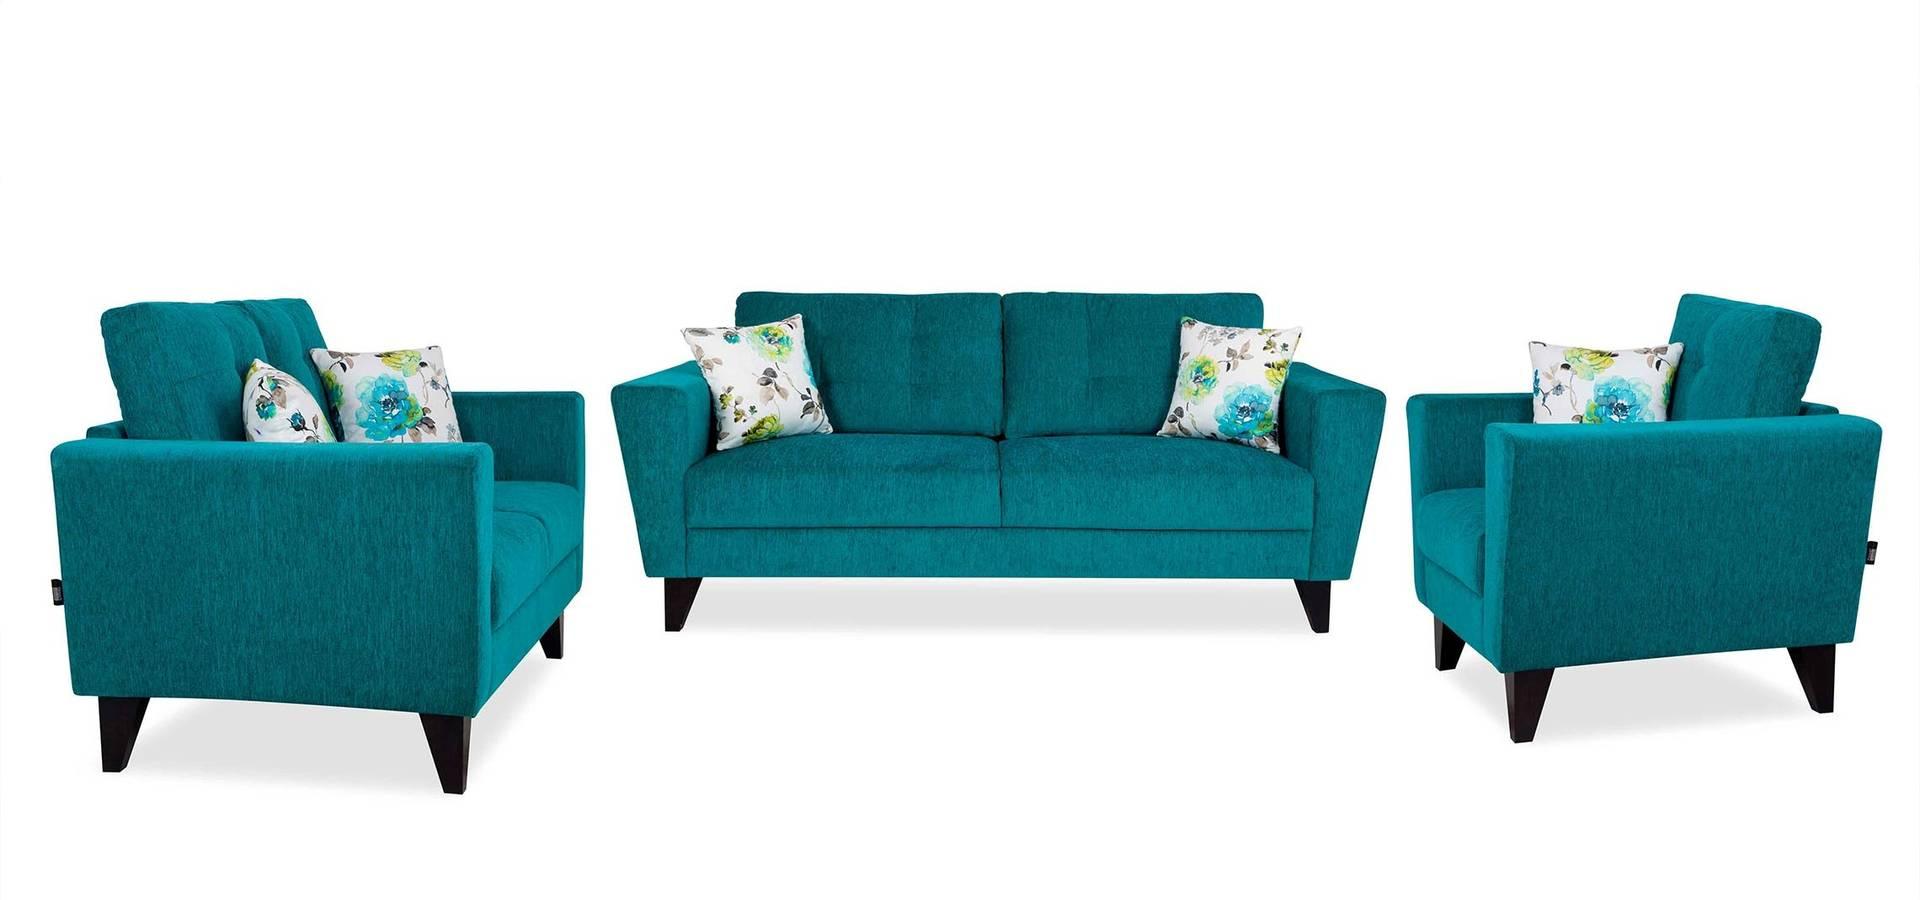 Vriksh of Life Furniture and Design Studio